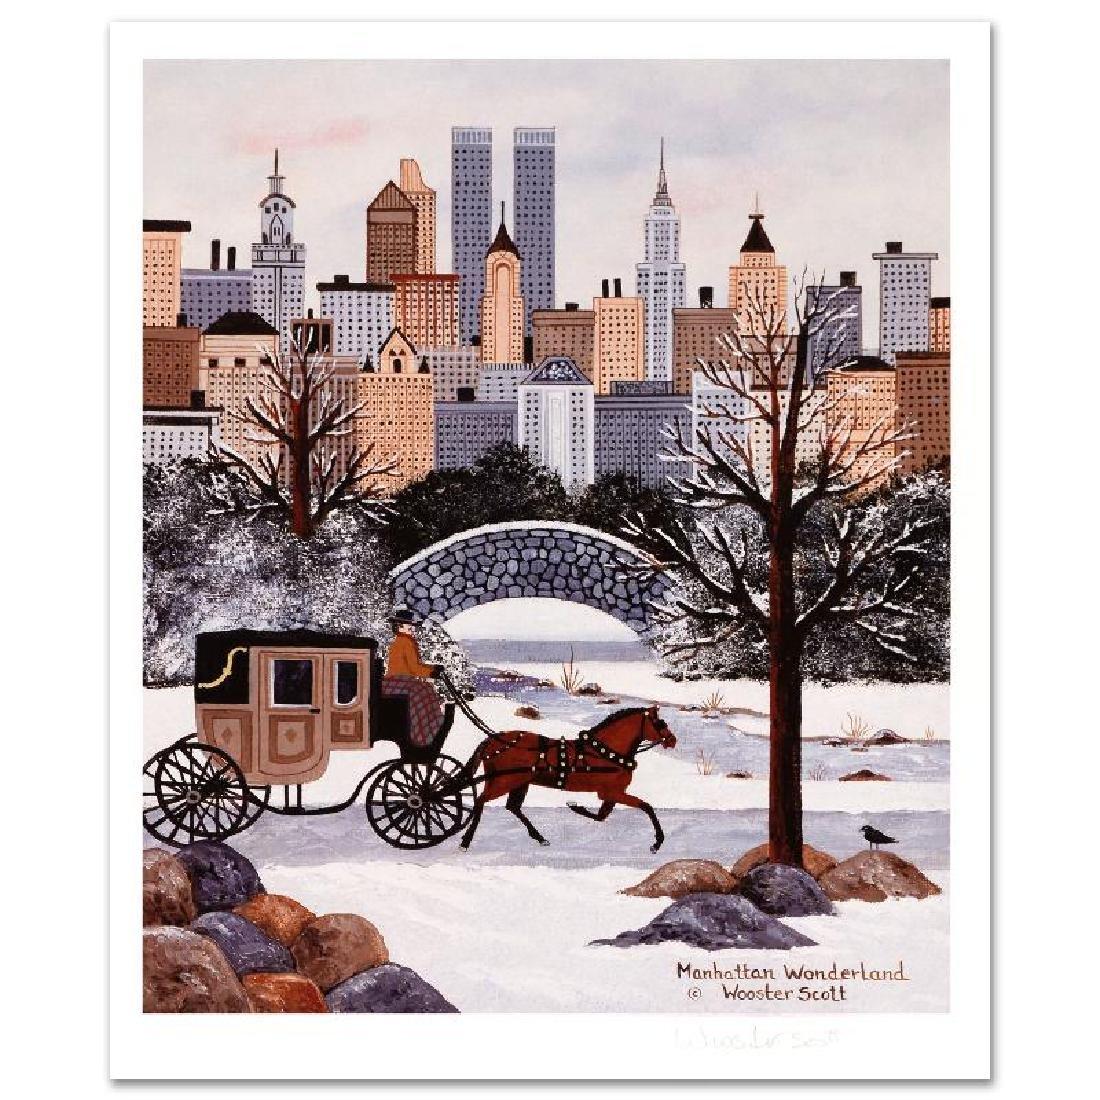 Manhattan Wonderland Limited Edition Lithograph by Jane